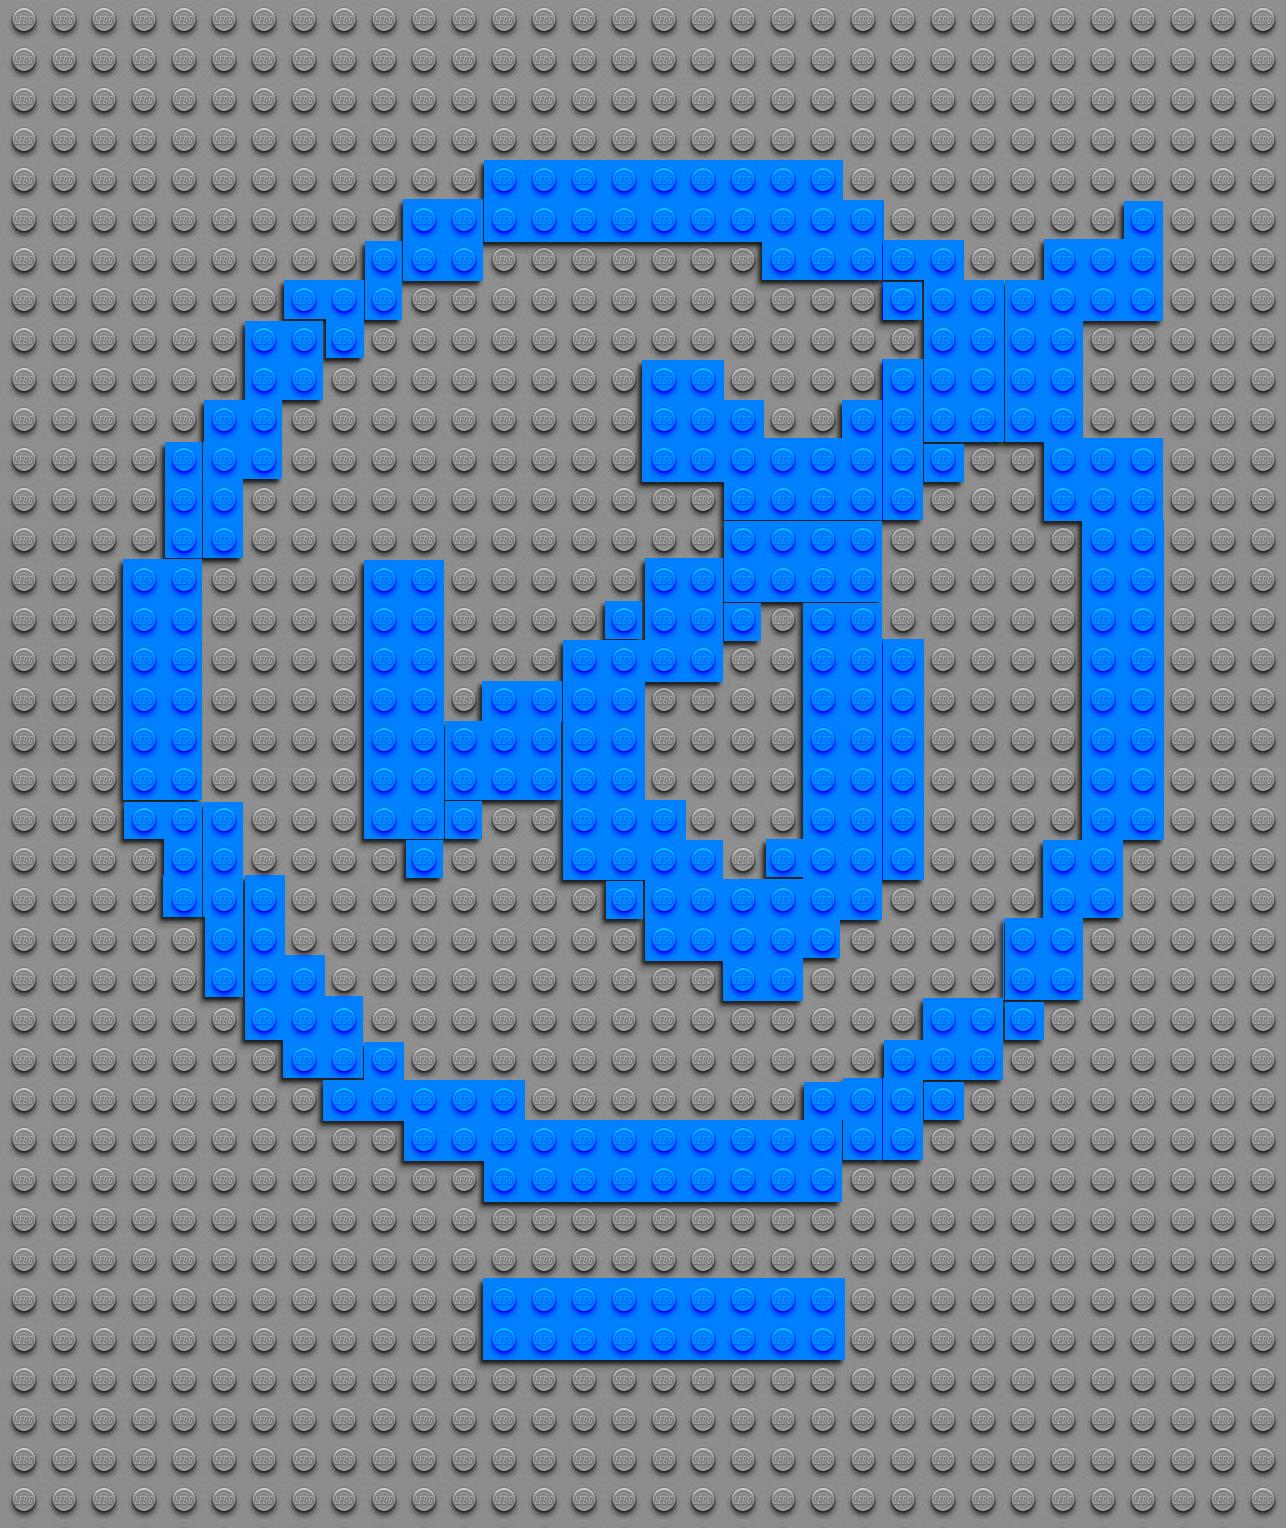 Logo Wisiwix